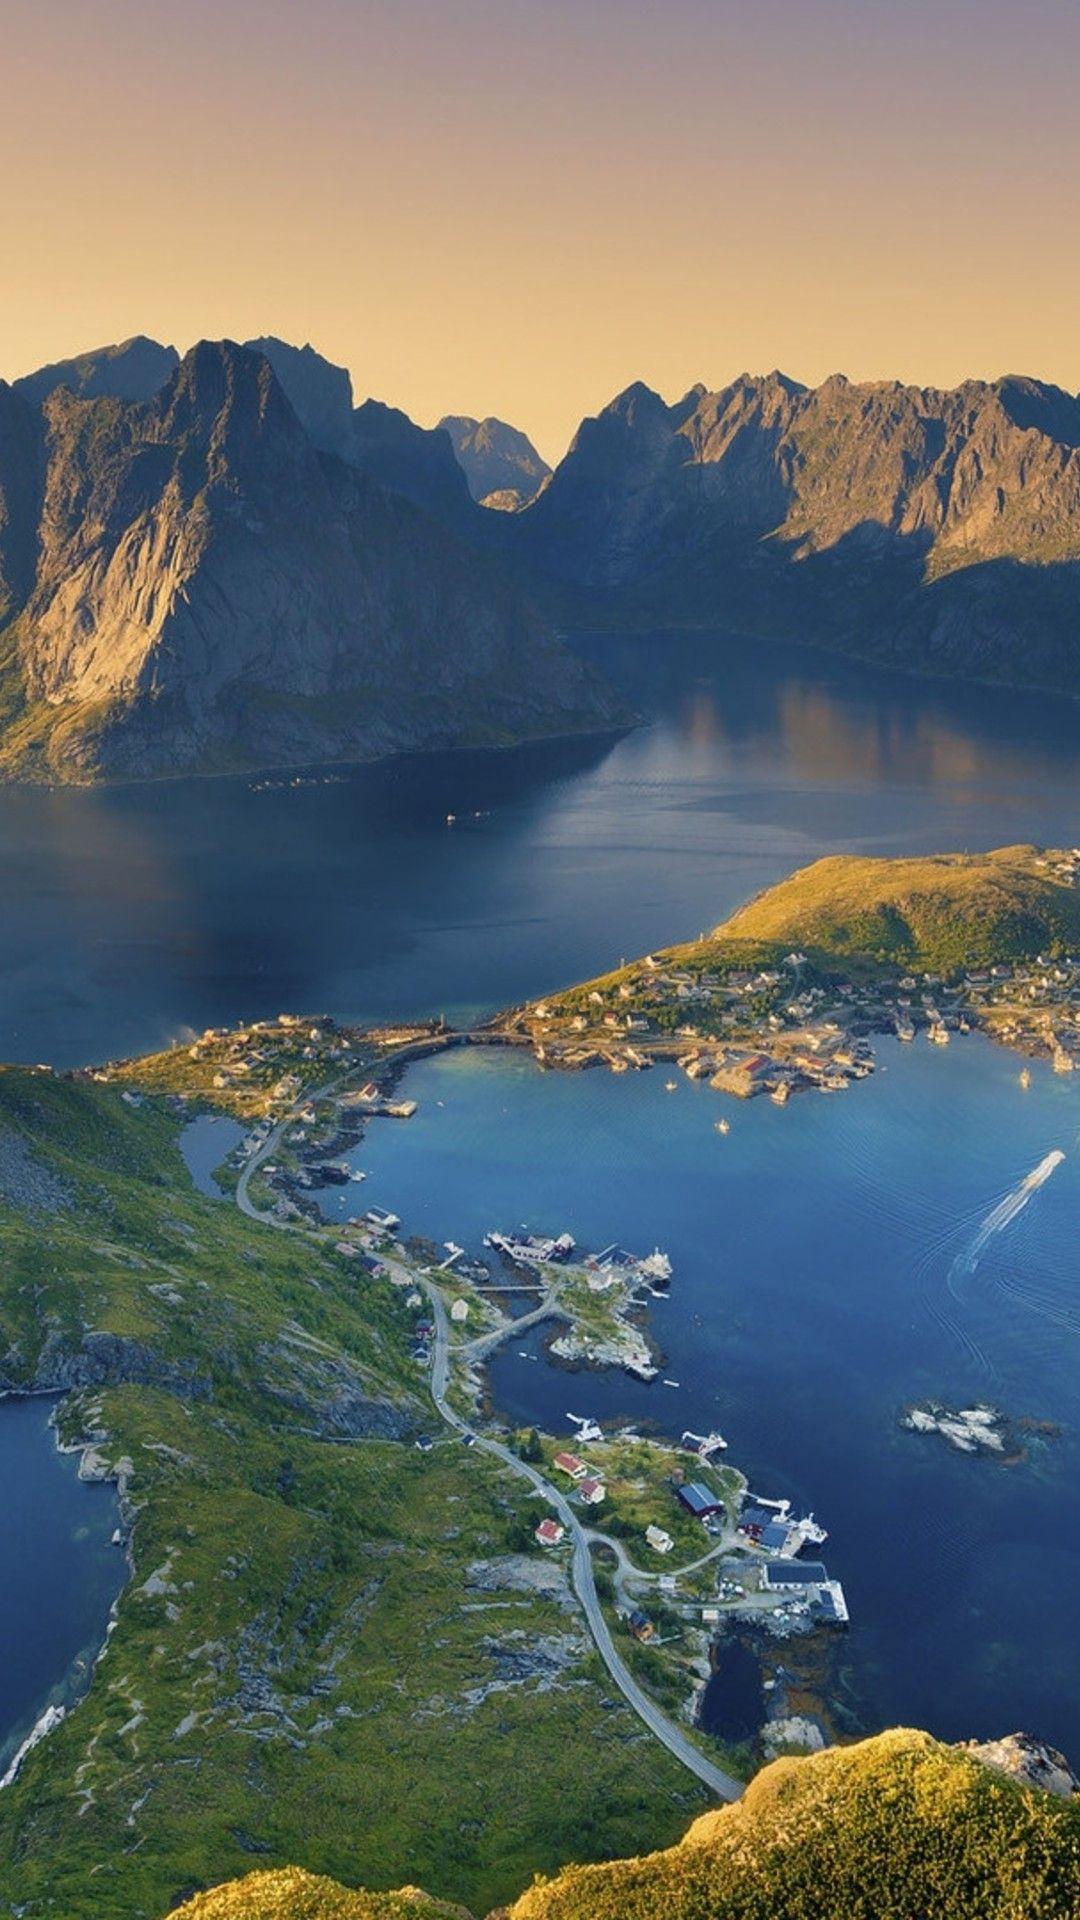 Wallpaper Download 1080x1920 Lofoten Island From Norway